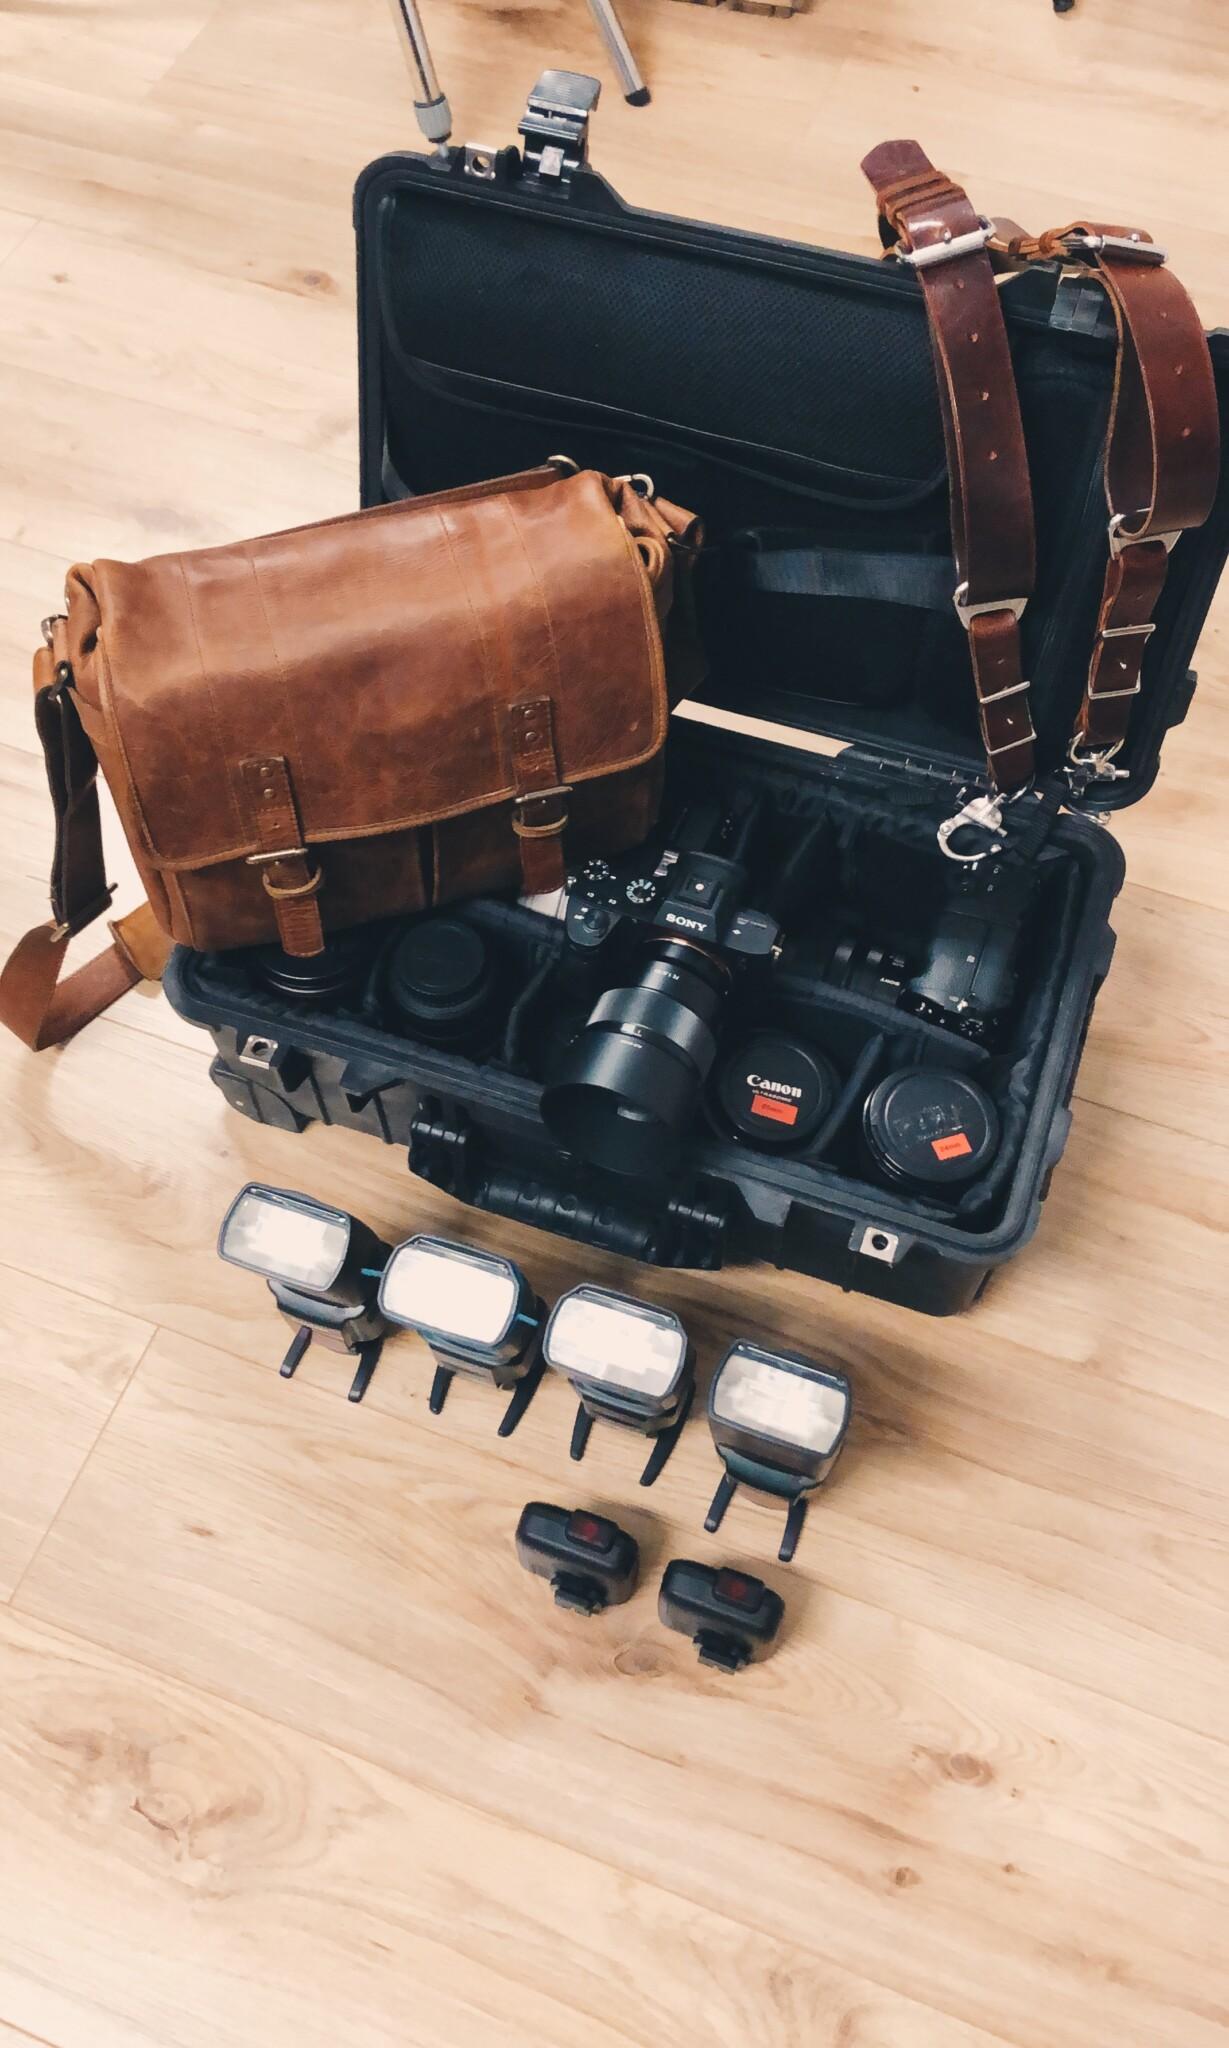 Wedding Photographer Equipment 2020